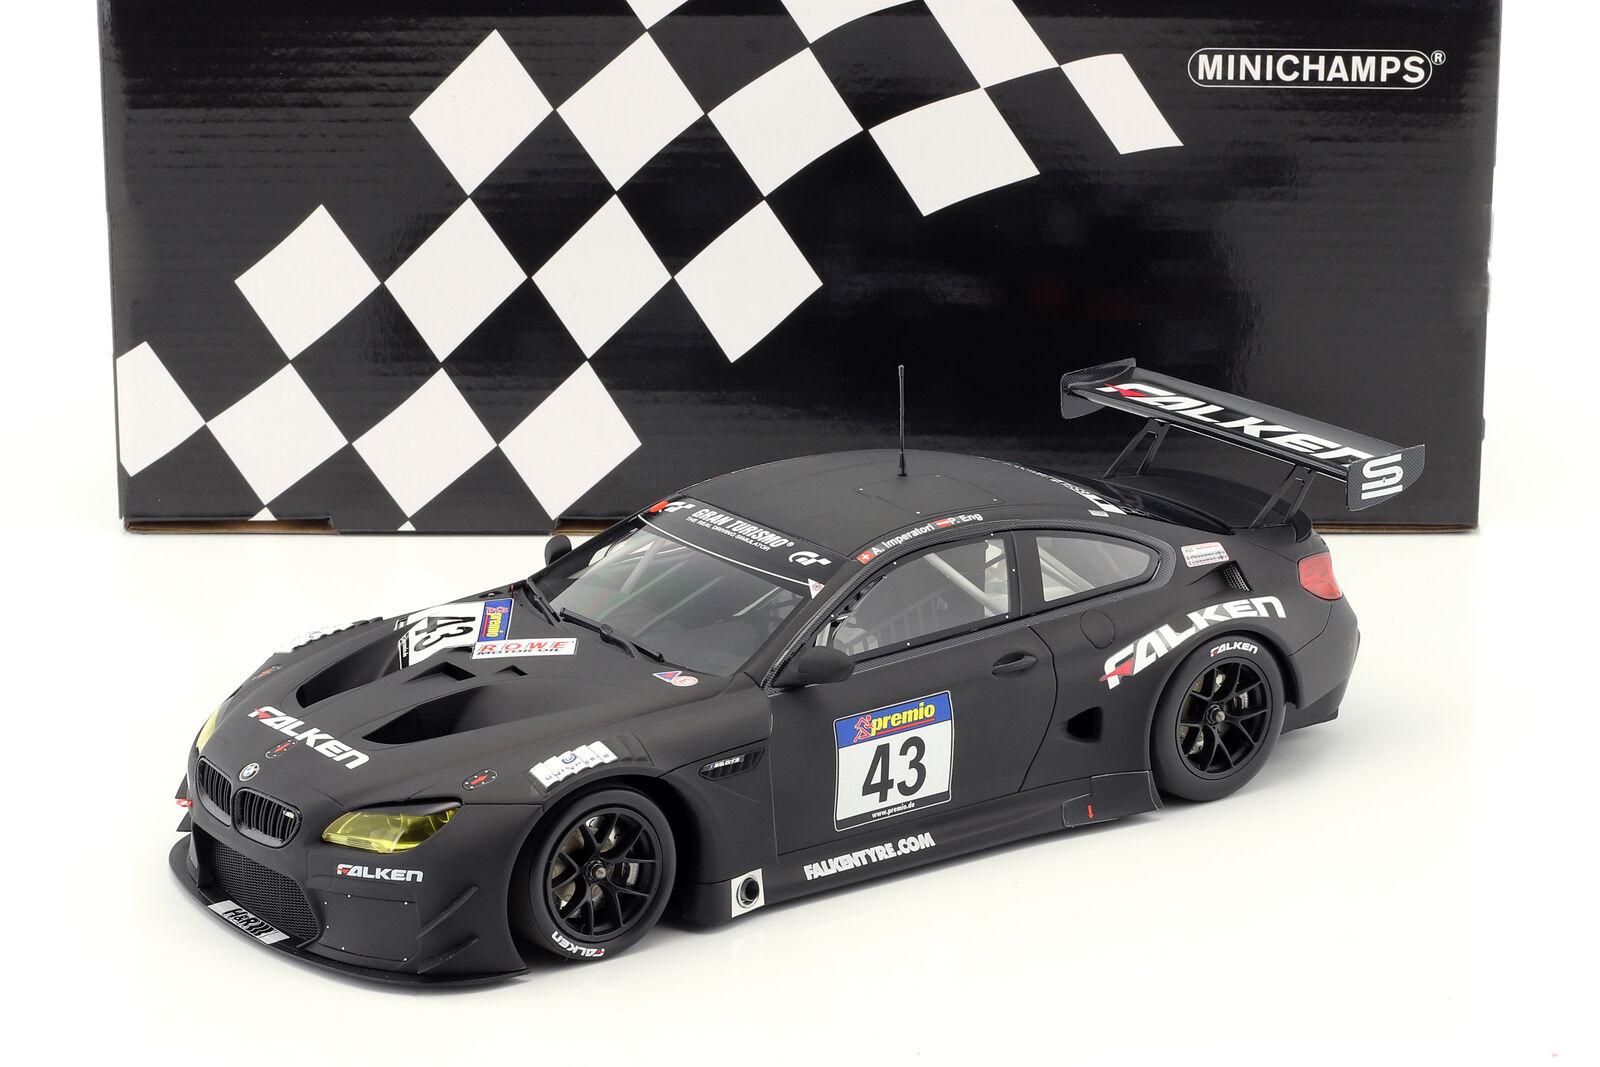 BMW M6 GT3  43 Dmv 250 Meilen Rennen Vln 2016 Imperatori, Eng 1 18 Minichamps